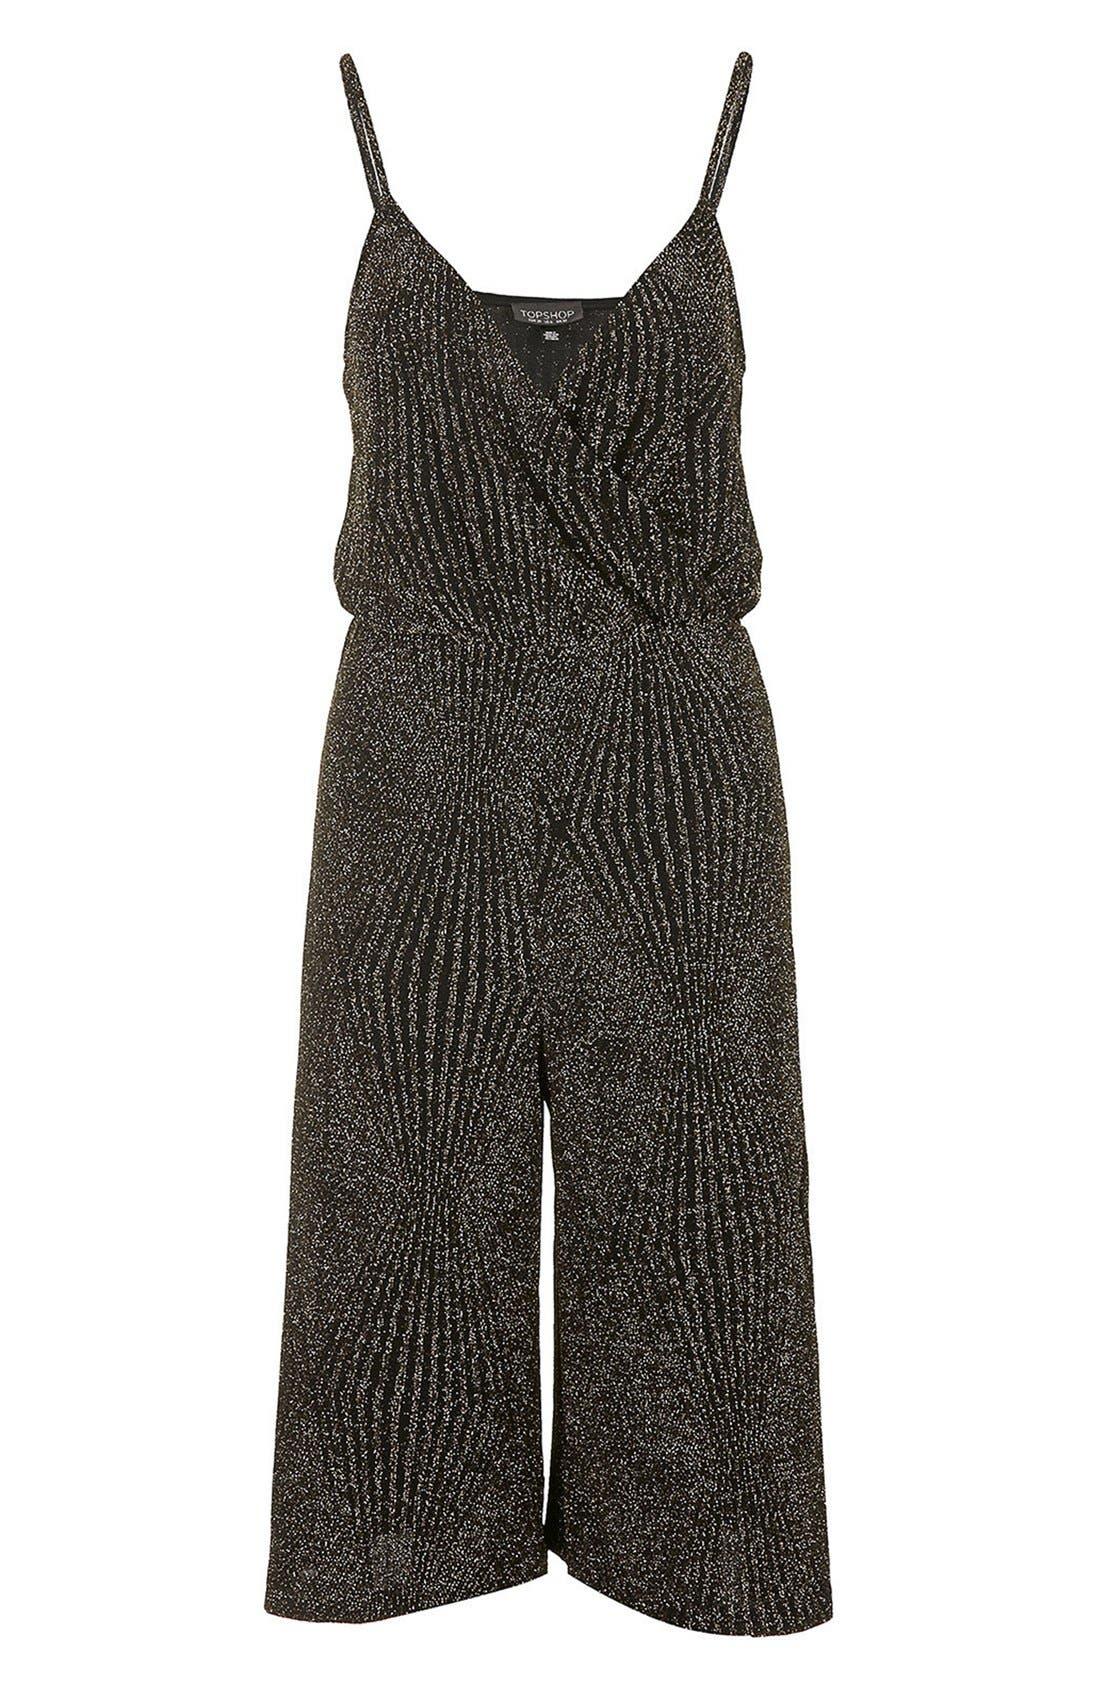 Alternate Image 3  - Topshop Culotte Jumpsuit